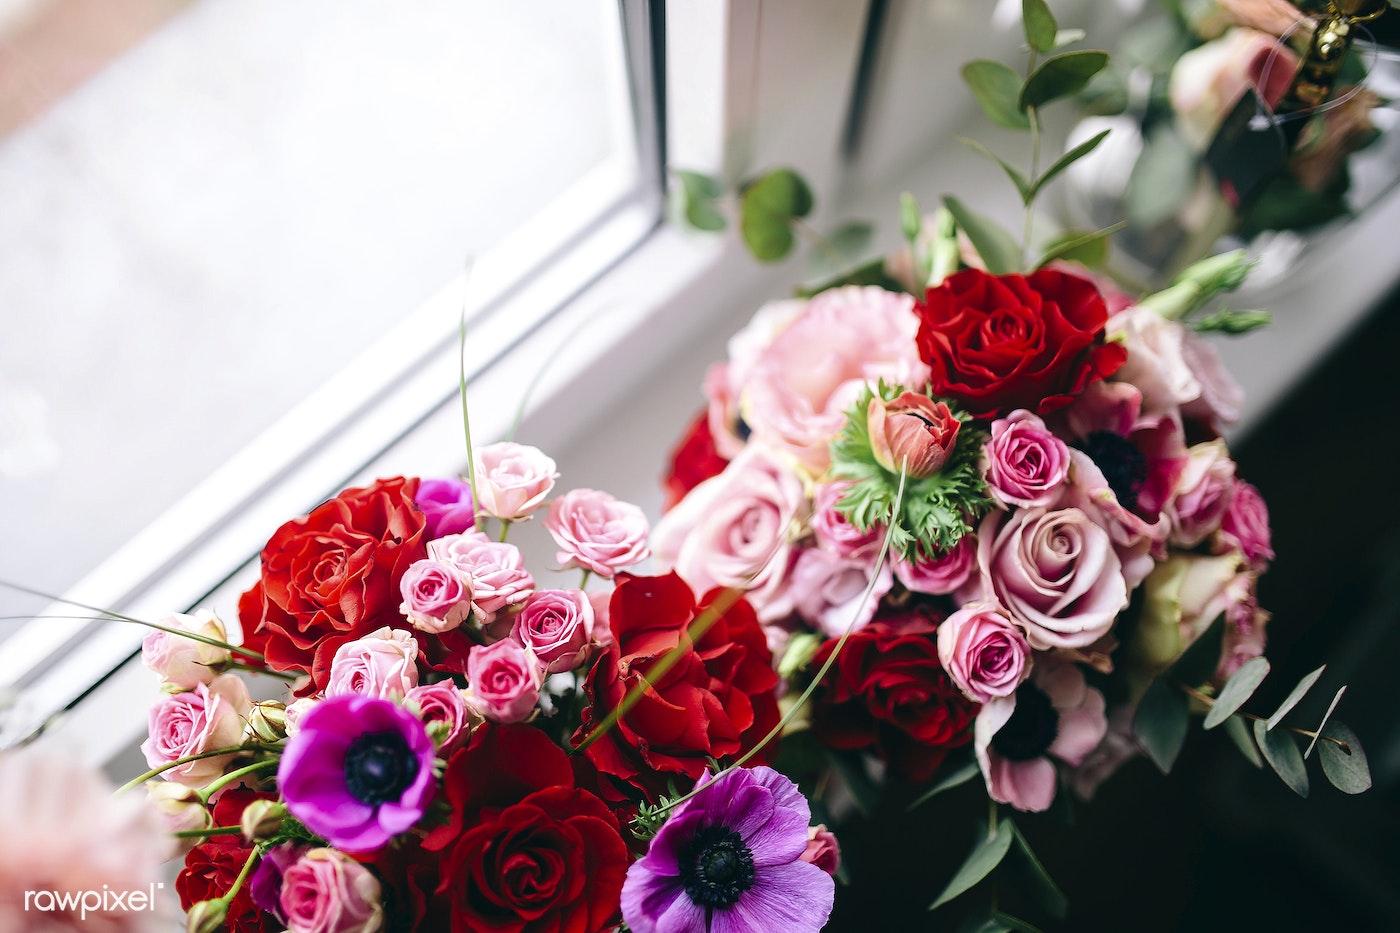 A Beautiful Bouquet Of Flowers By Karolina Kaboompics Id 435630